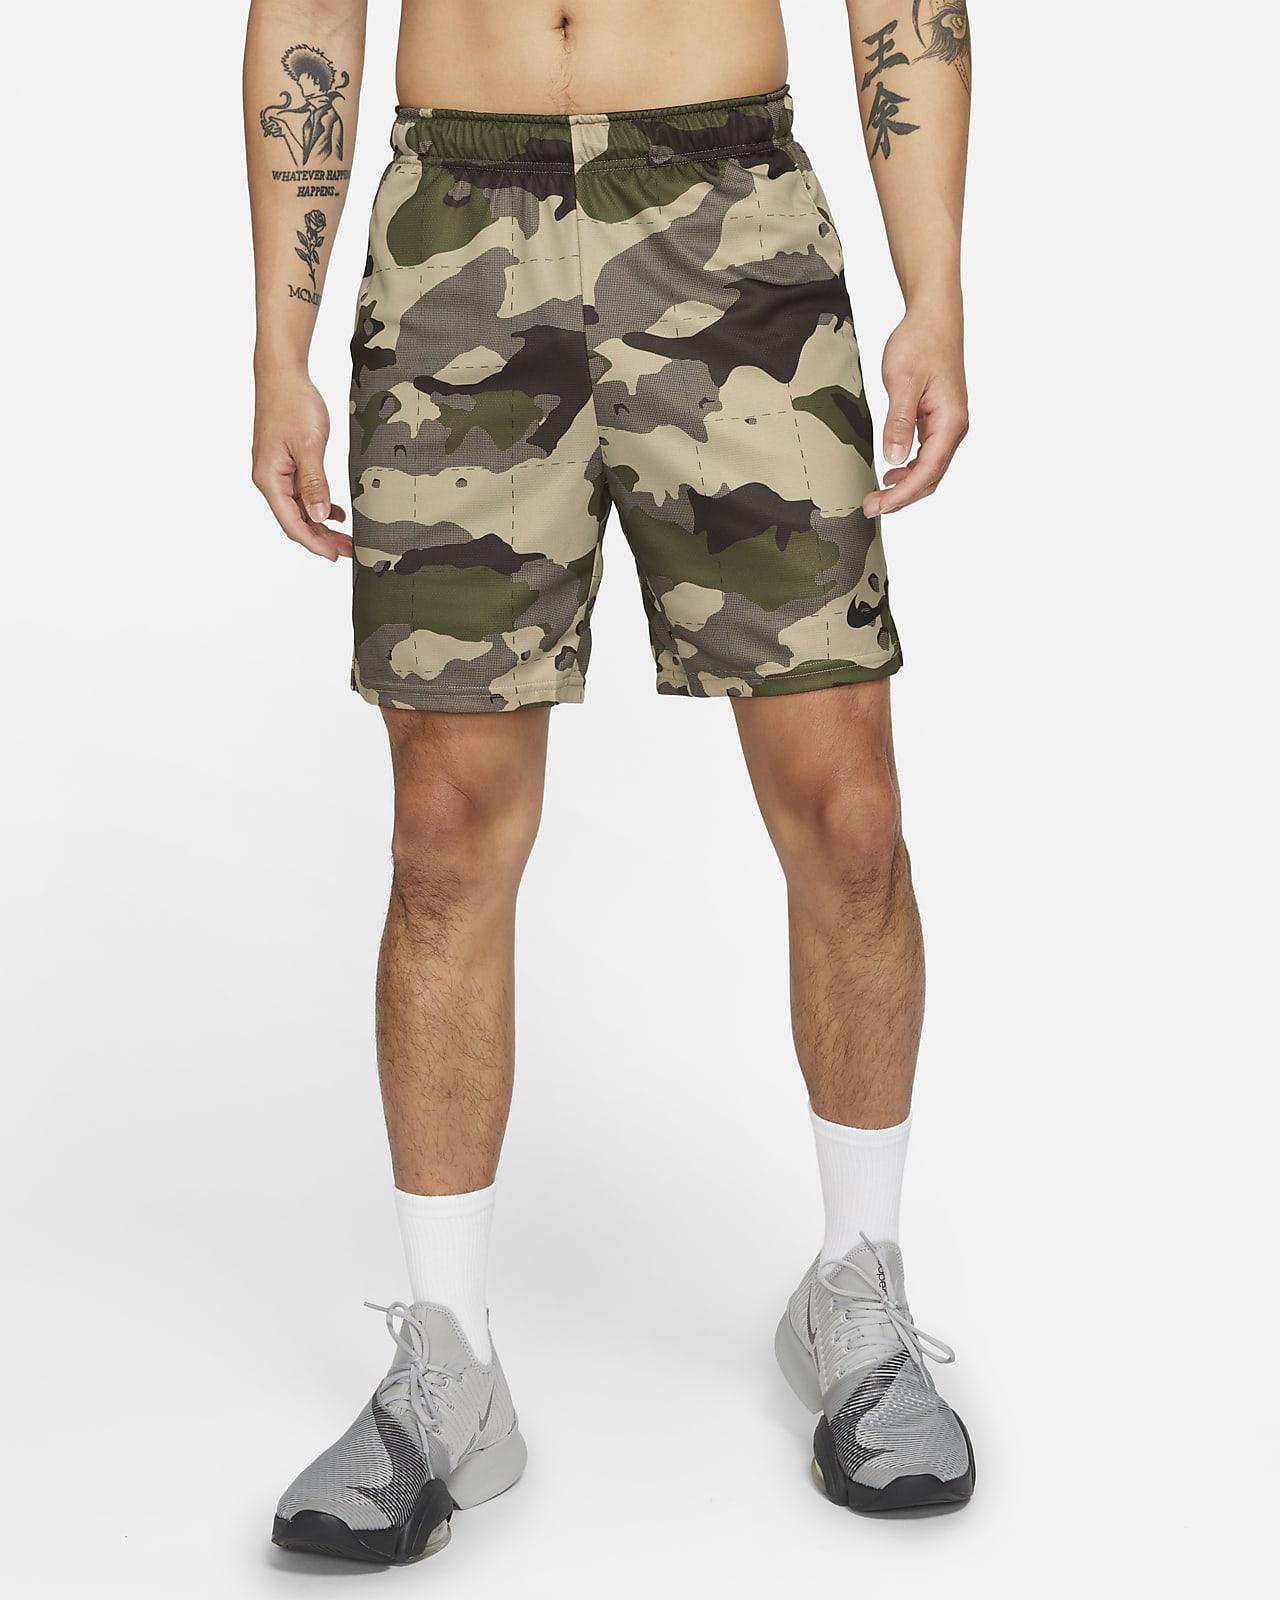 Nike Dri-FIT Men's Camo Training Shorts